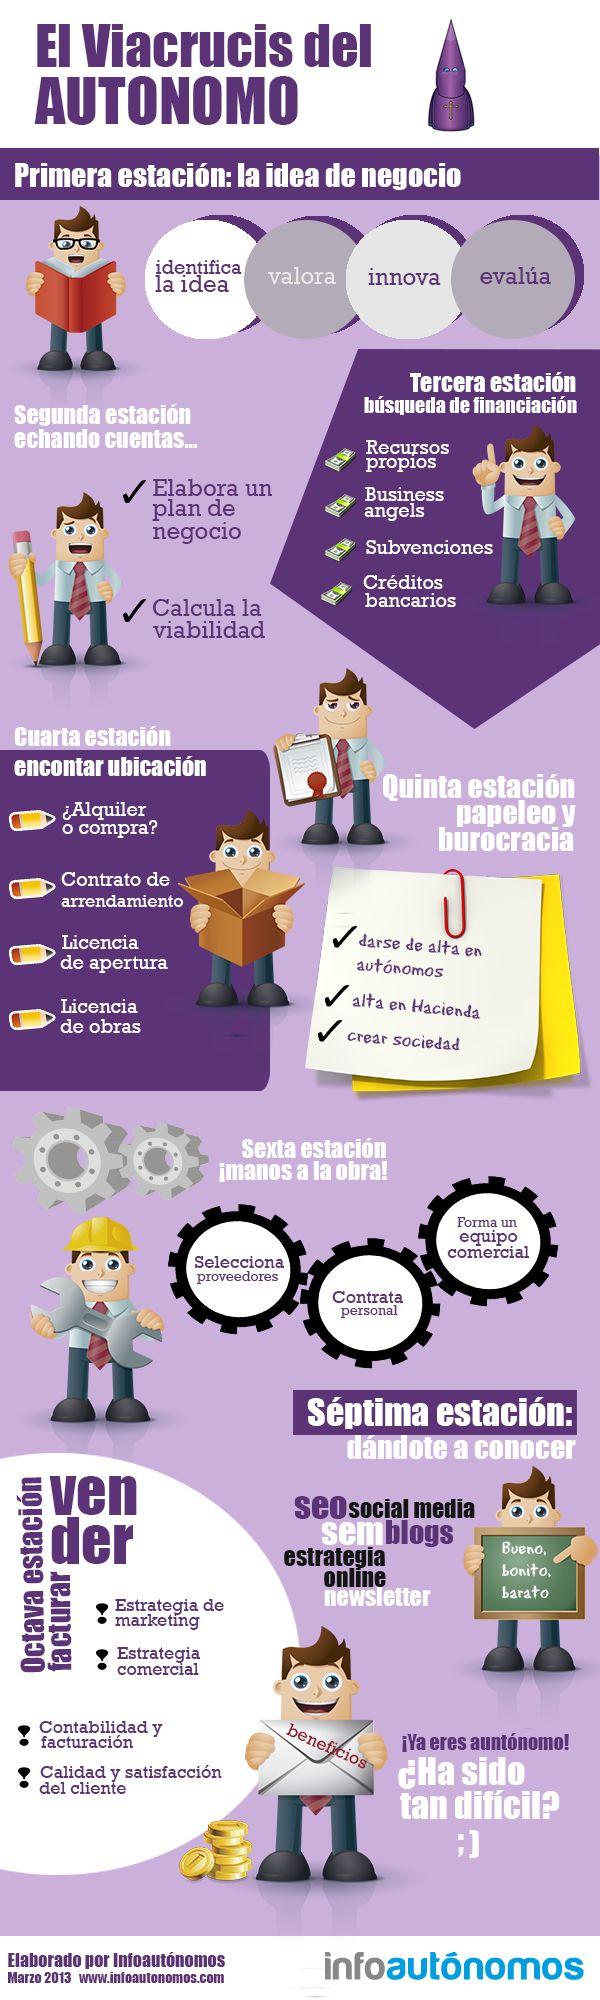 El Viacrucis del autónomo #infografia #infographic